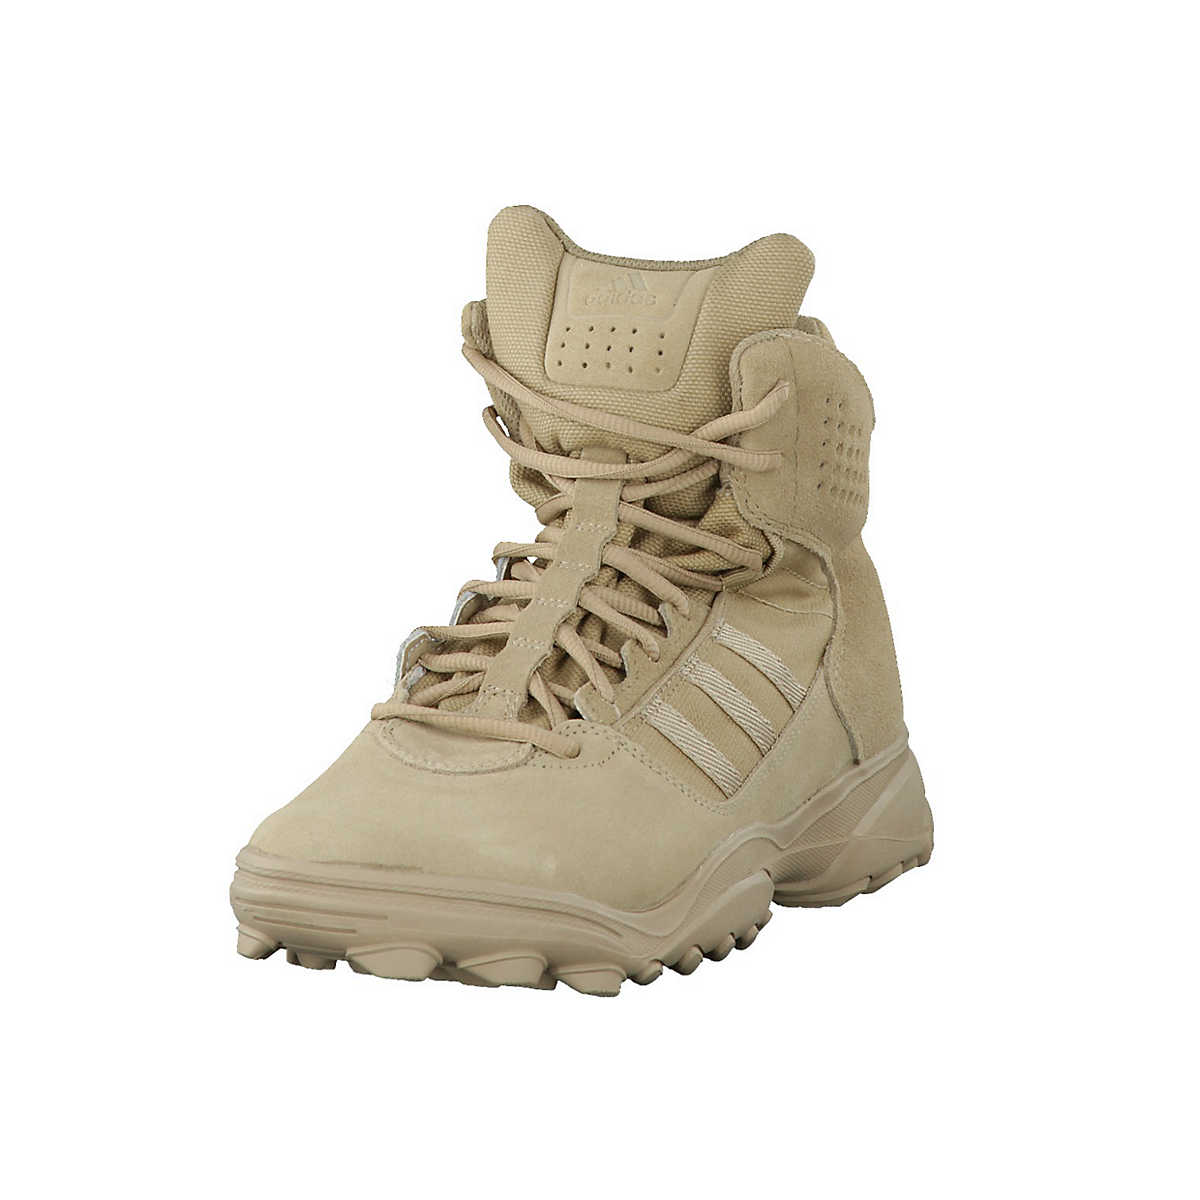 adidas Sportschuhe hellbraun - adidas - Stiefeletten - Schuhe - mirapodo.de